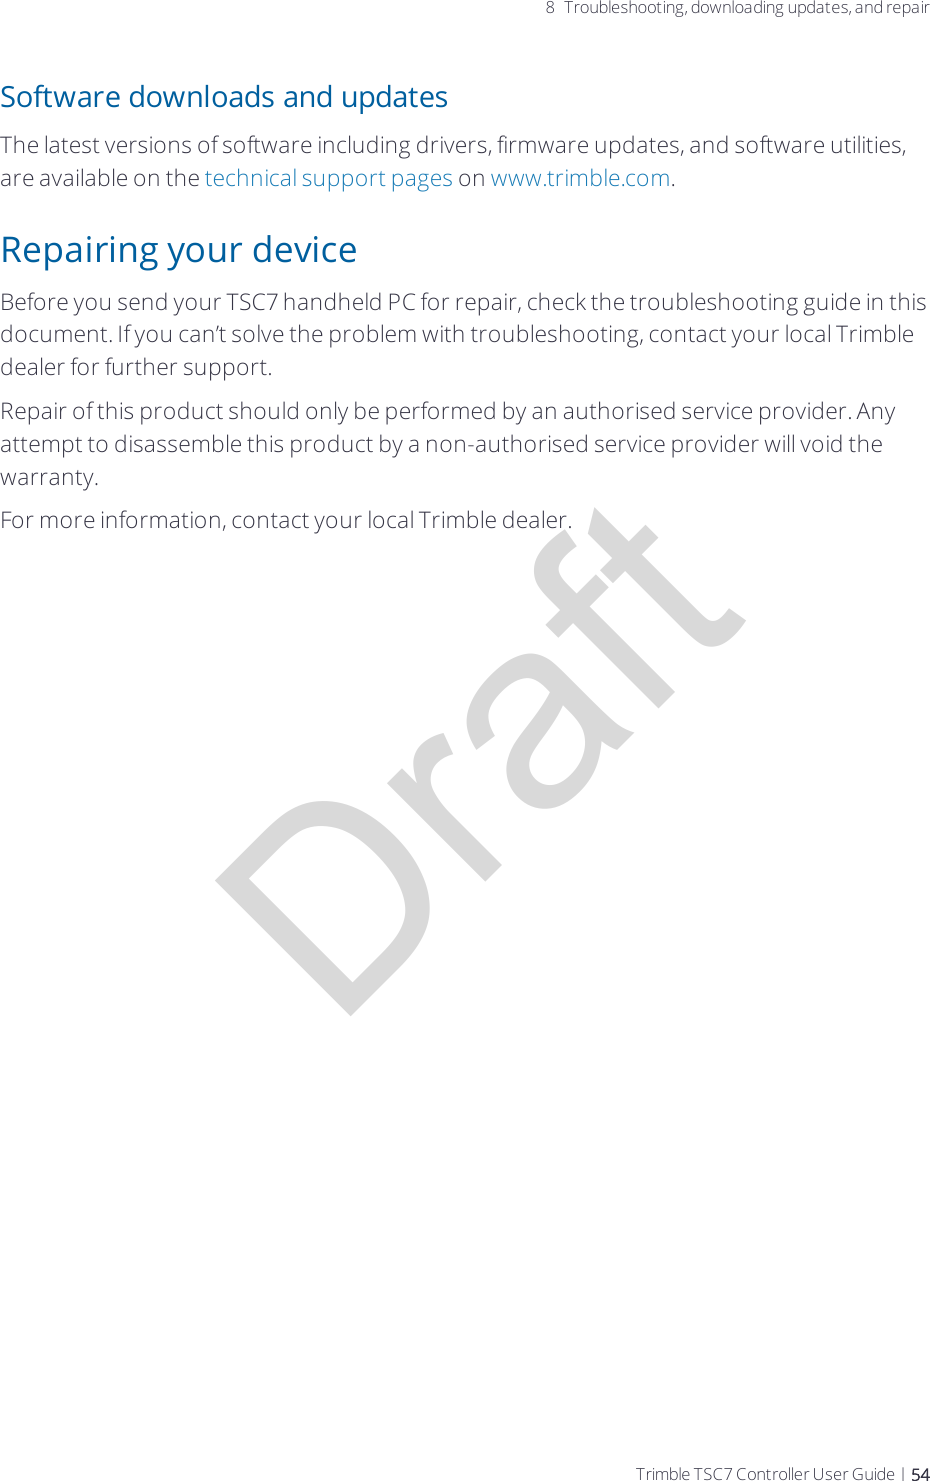 Trimble EM7455 Radio Module User Manual Trimble TSC7